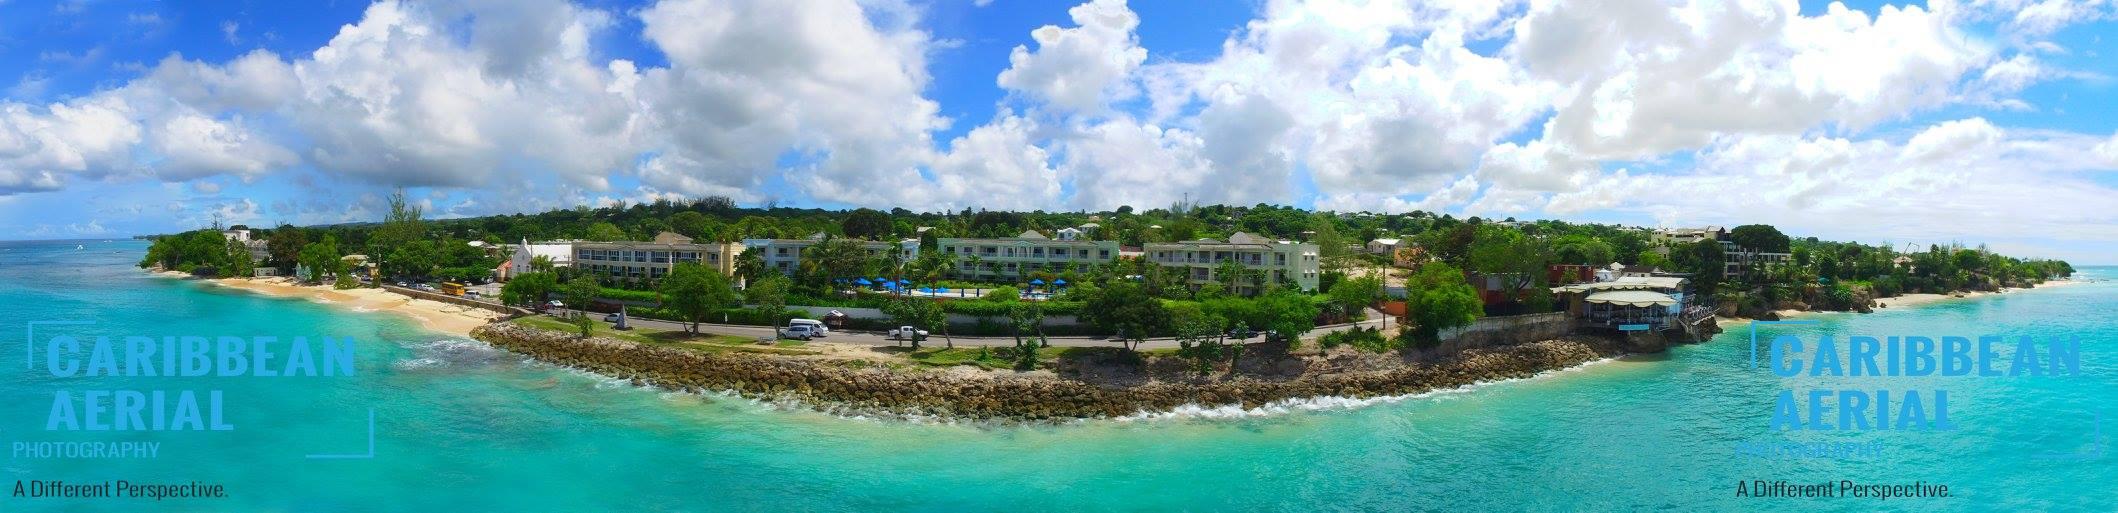 caribbean-aerial-photography-008